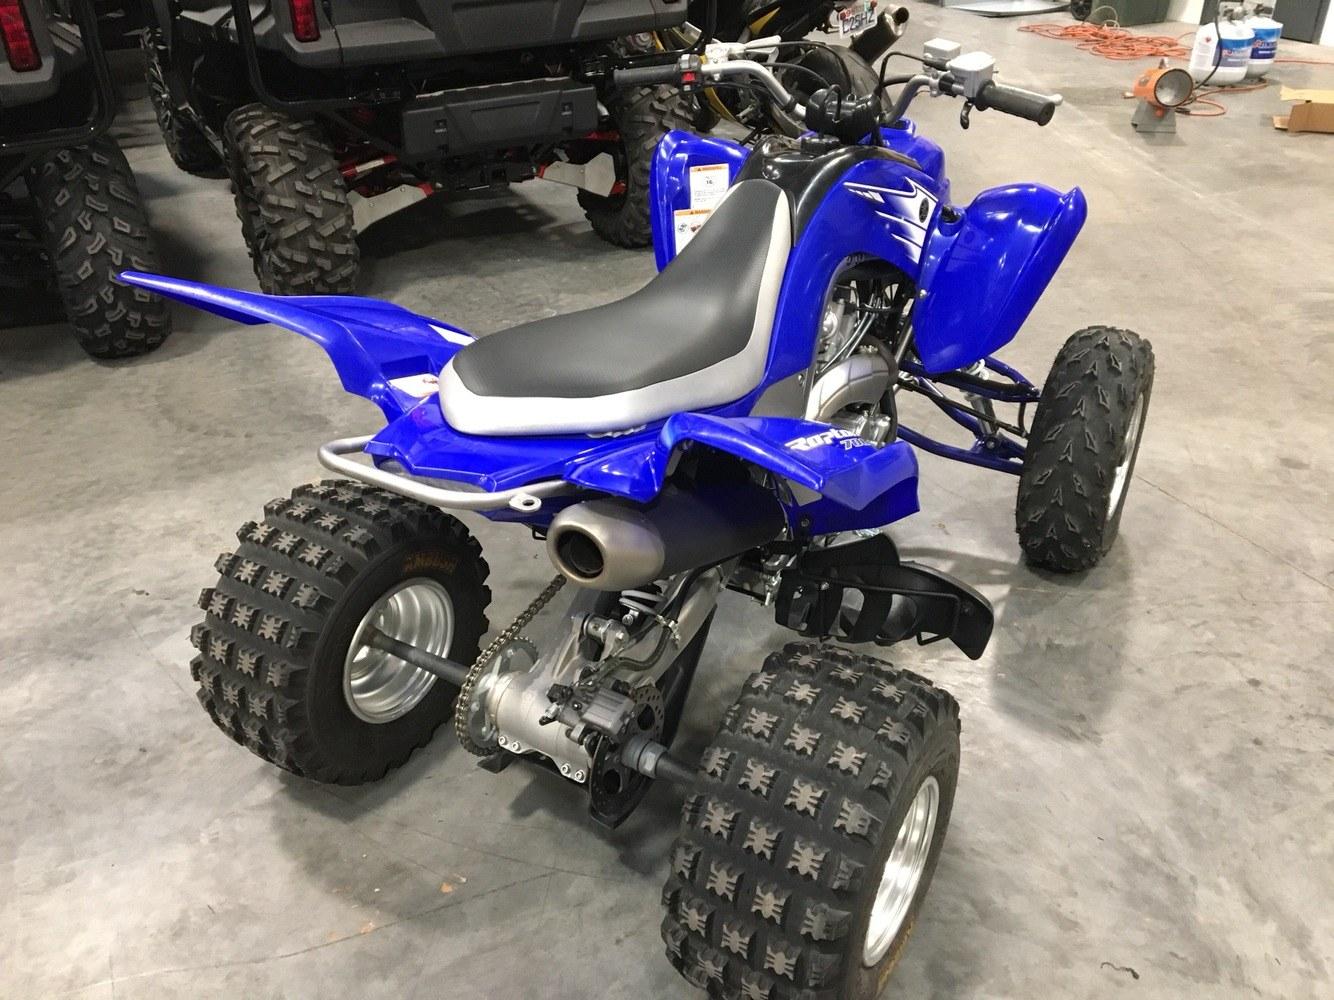 2007 Yamaha Raptor 700R 6